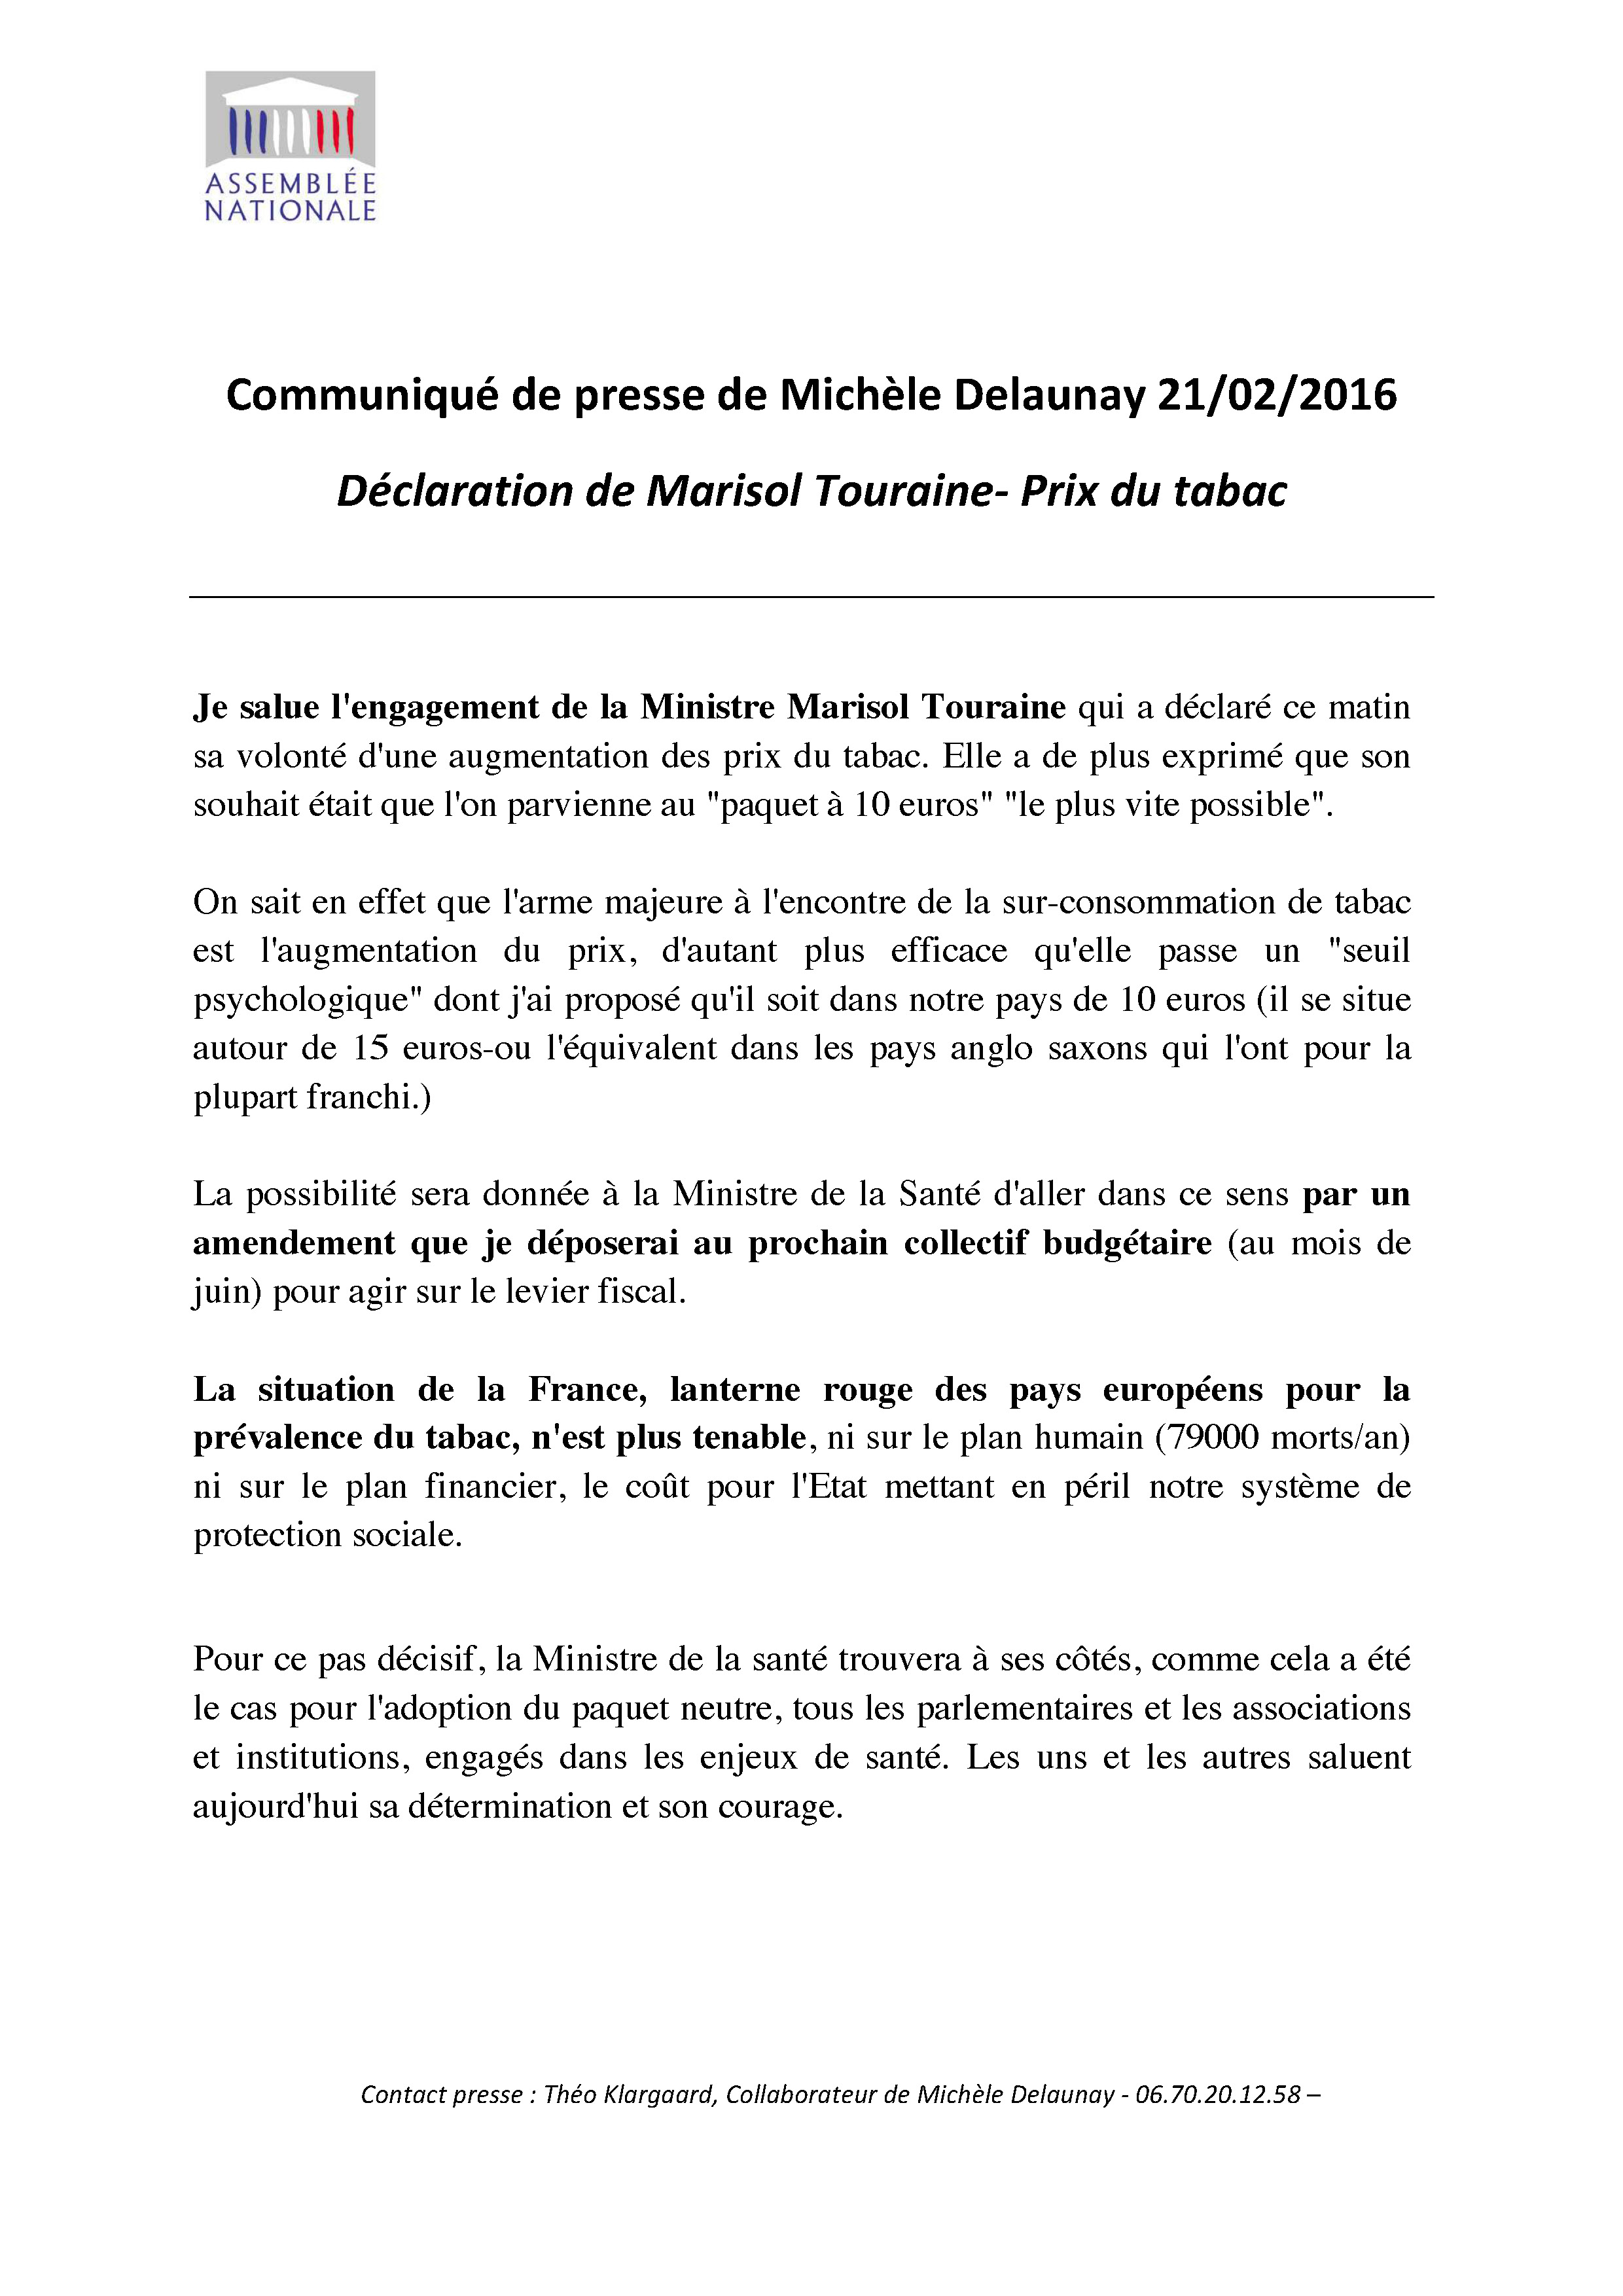 Alliance-CP_declaration-de-marisol-touraine-prix-tabac-21fev2016.jpg